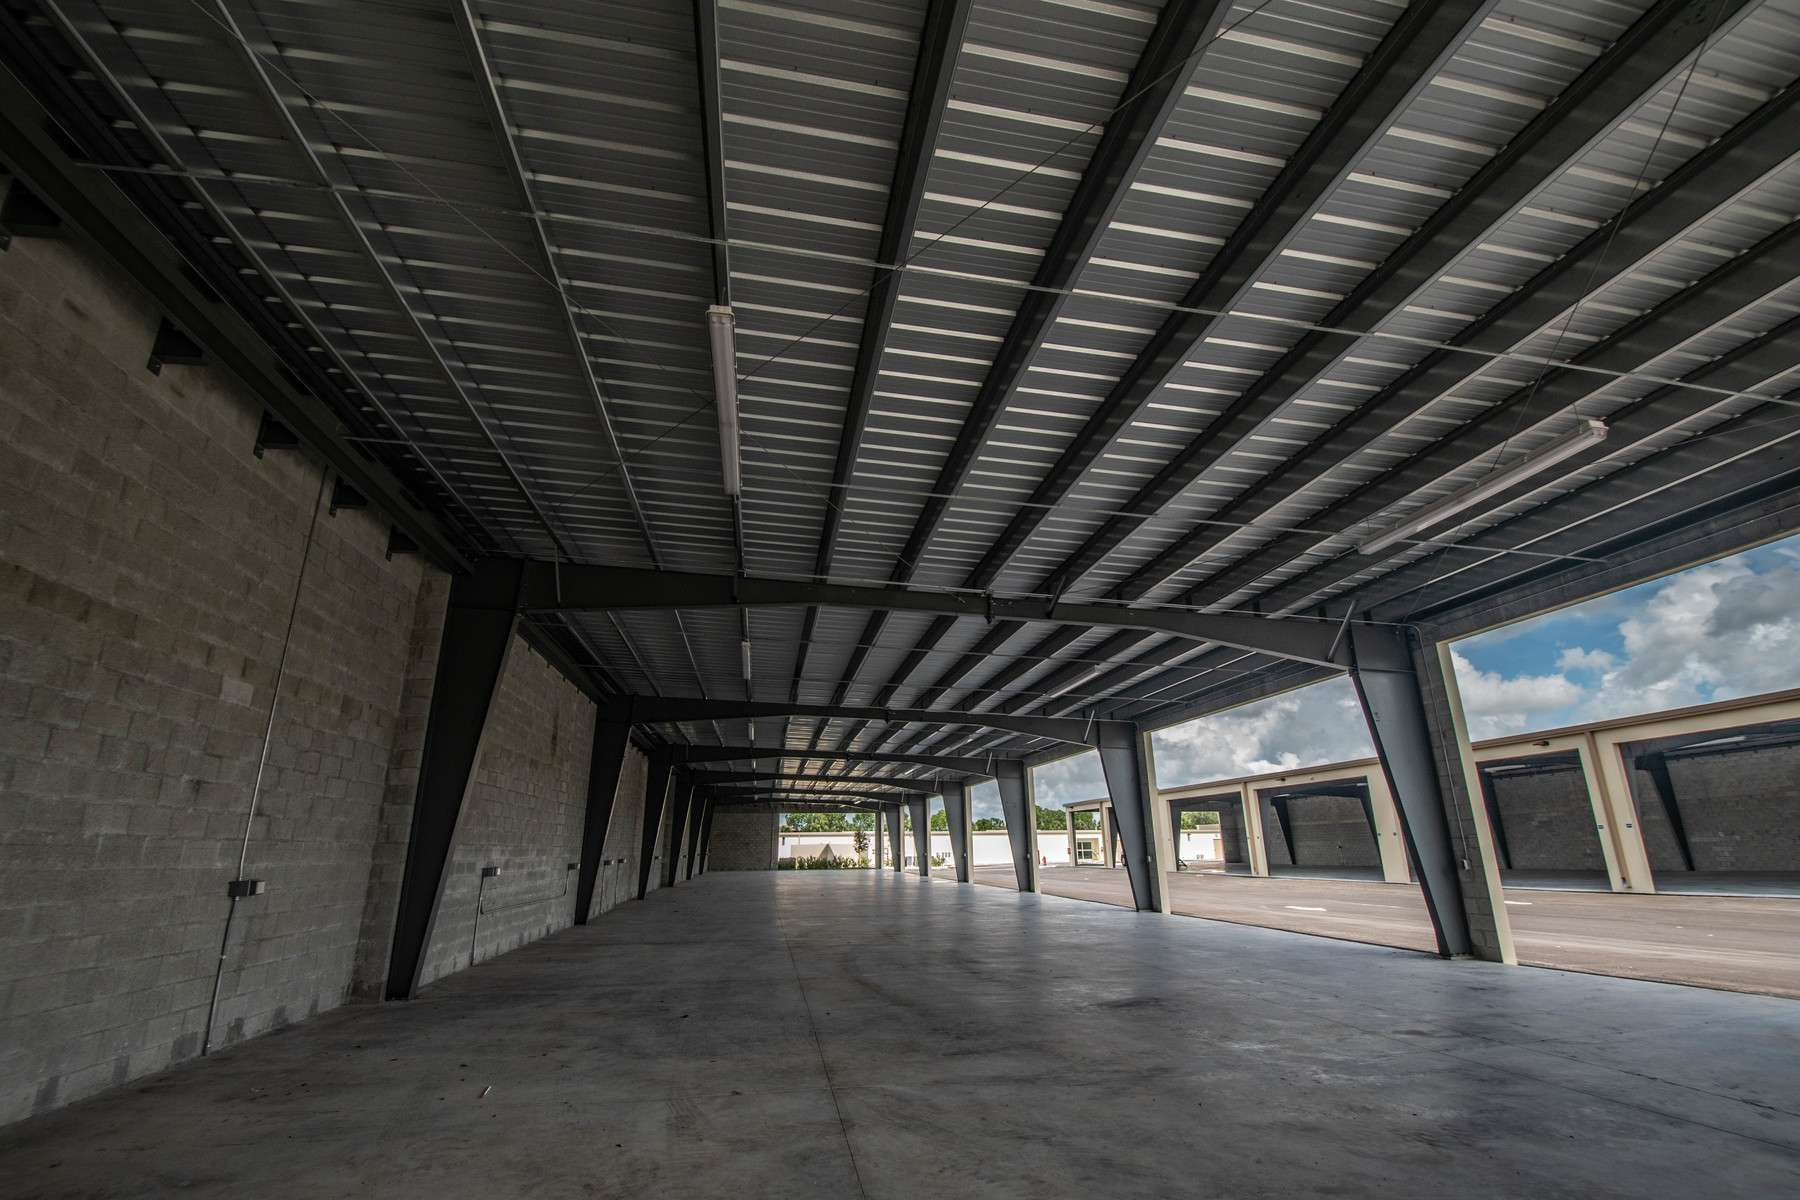 Lantana Self Storage Palm Beach County Self Storage Large Storage Units Available 441 Lantana Storage